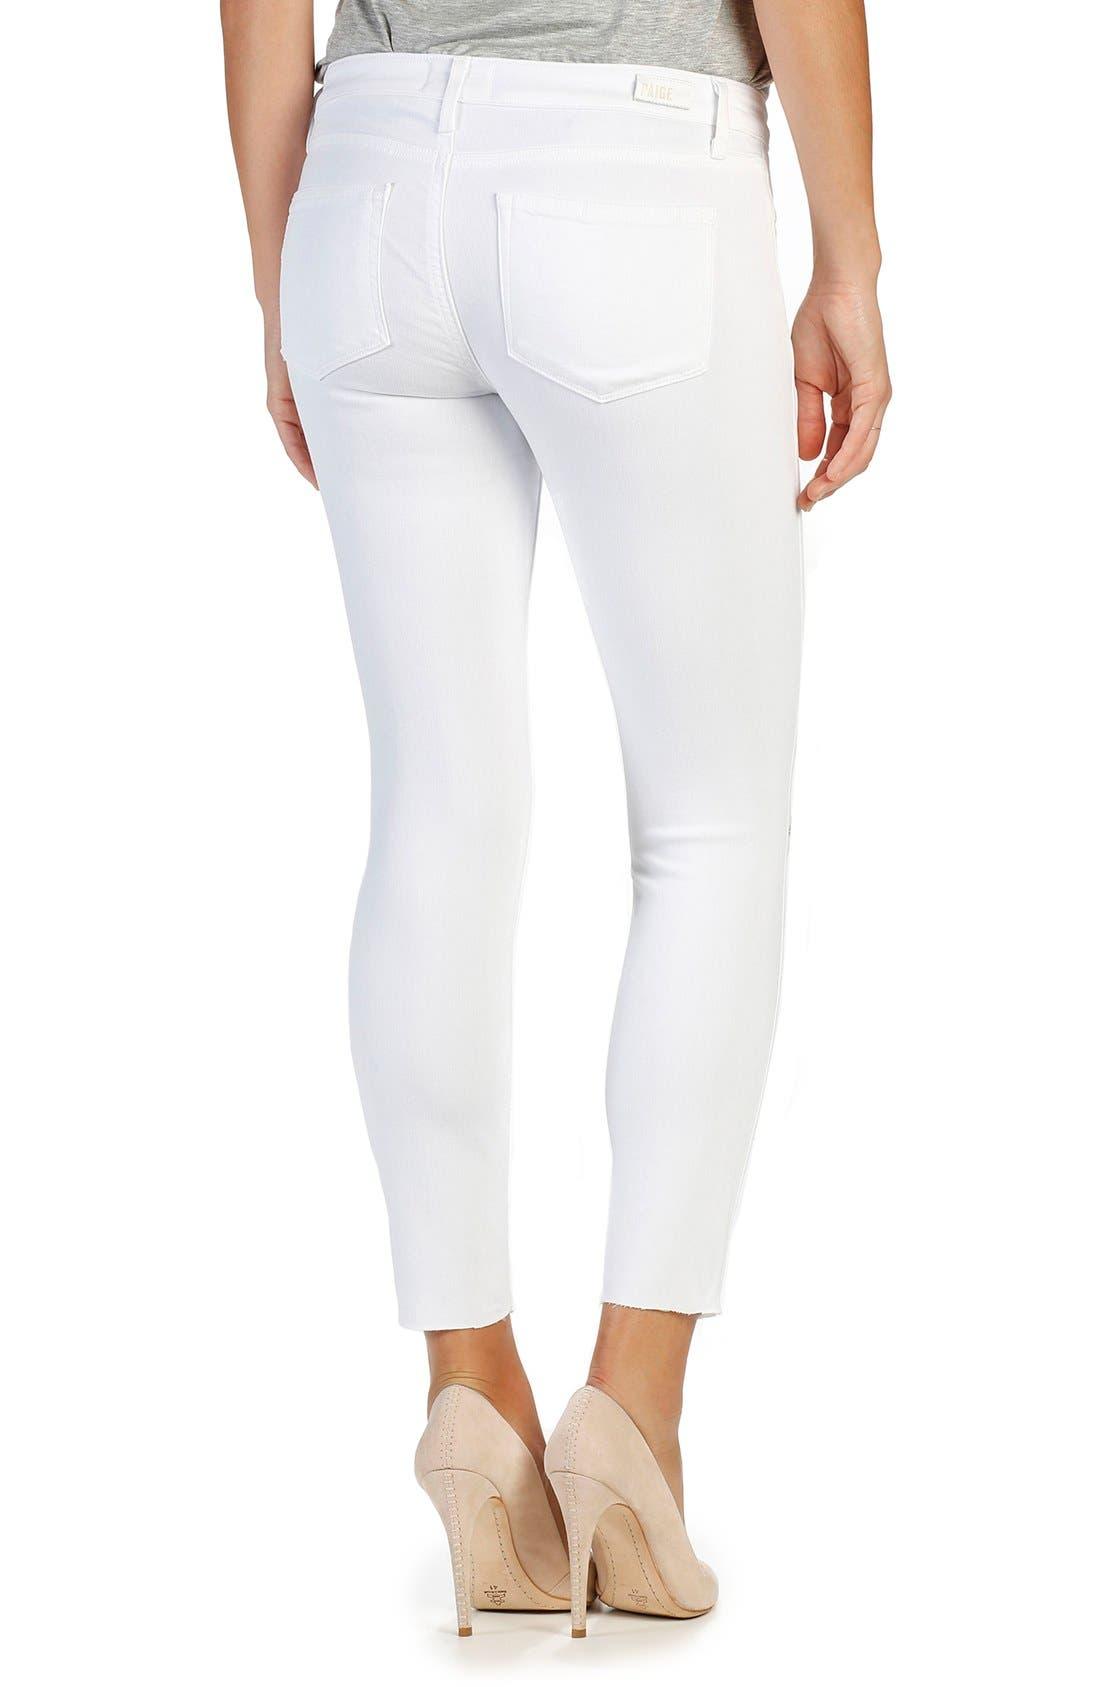 Alternate Image 2  - PAIGE Transcend - Verdugo Ankle Skinny Jeans (White Cloud Destructed)